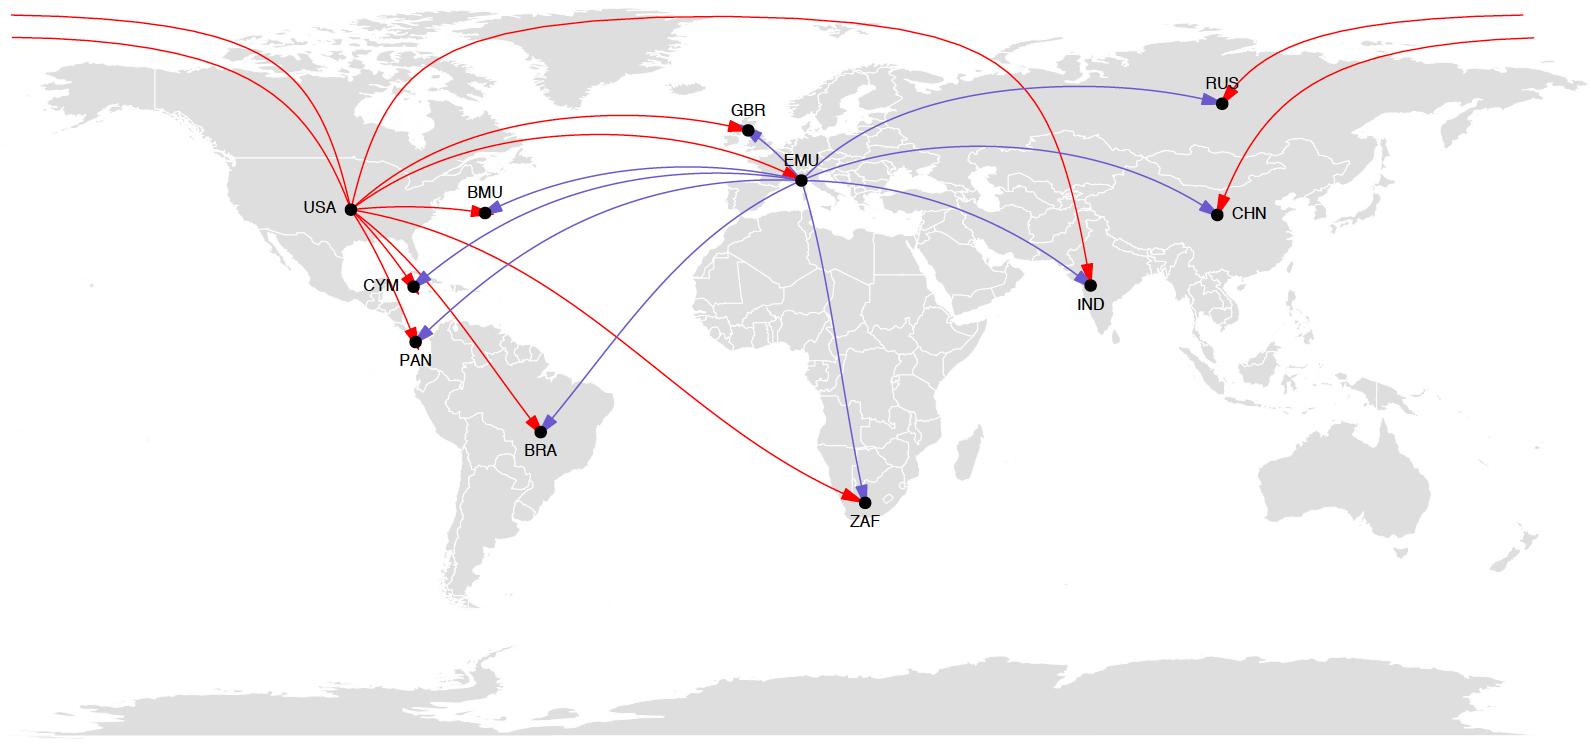 Global Capital Allocation Map